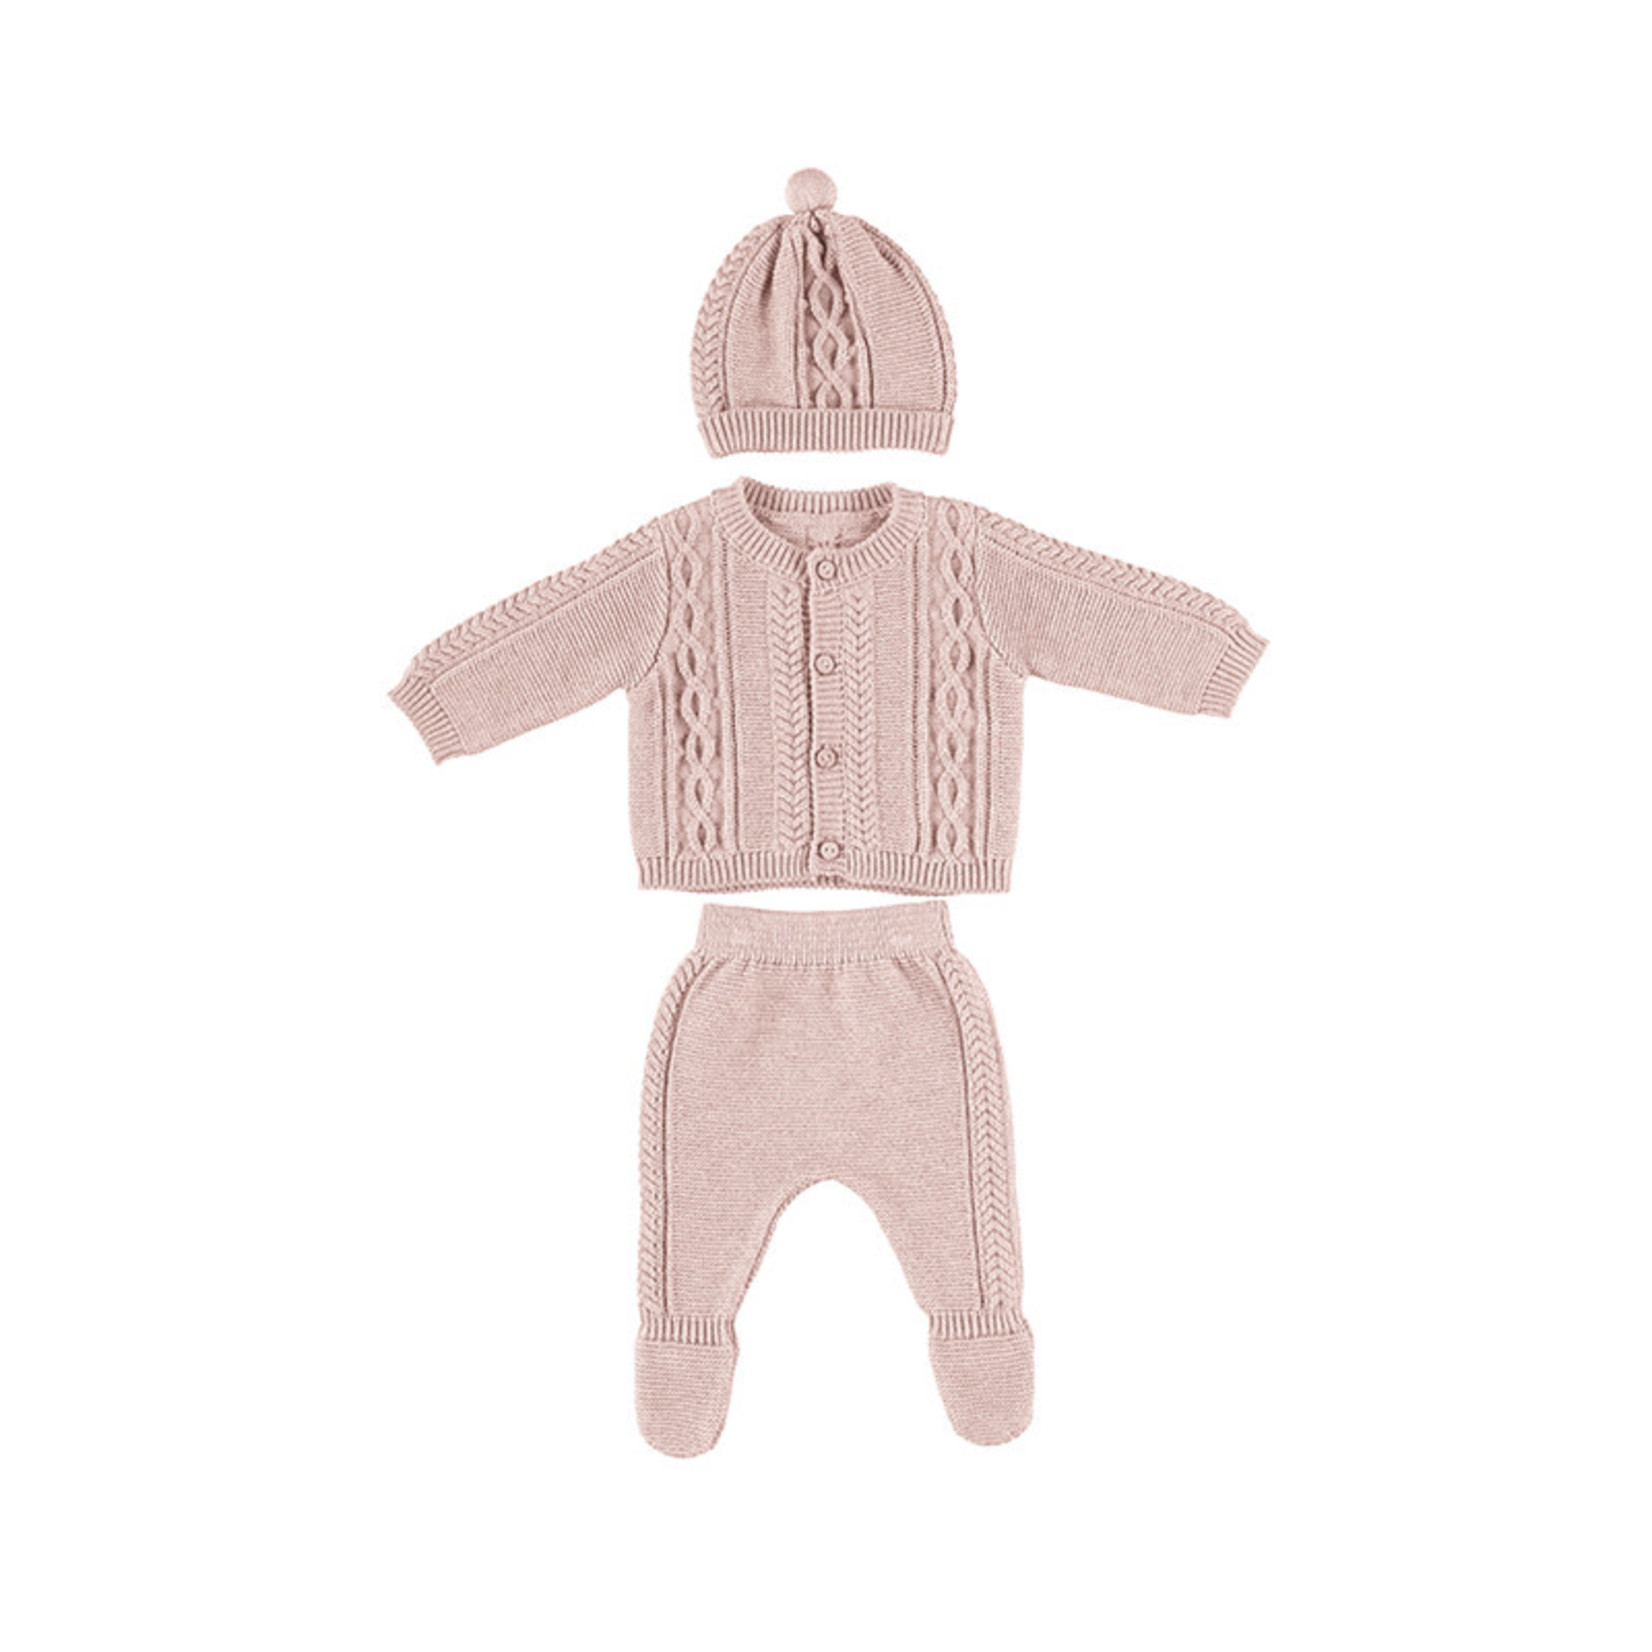 Mayoral Baby Set Pink - Mayoral